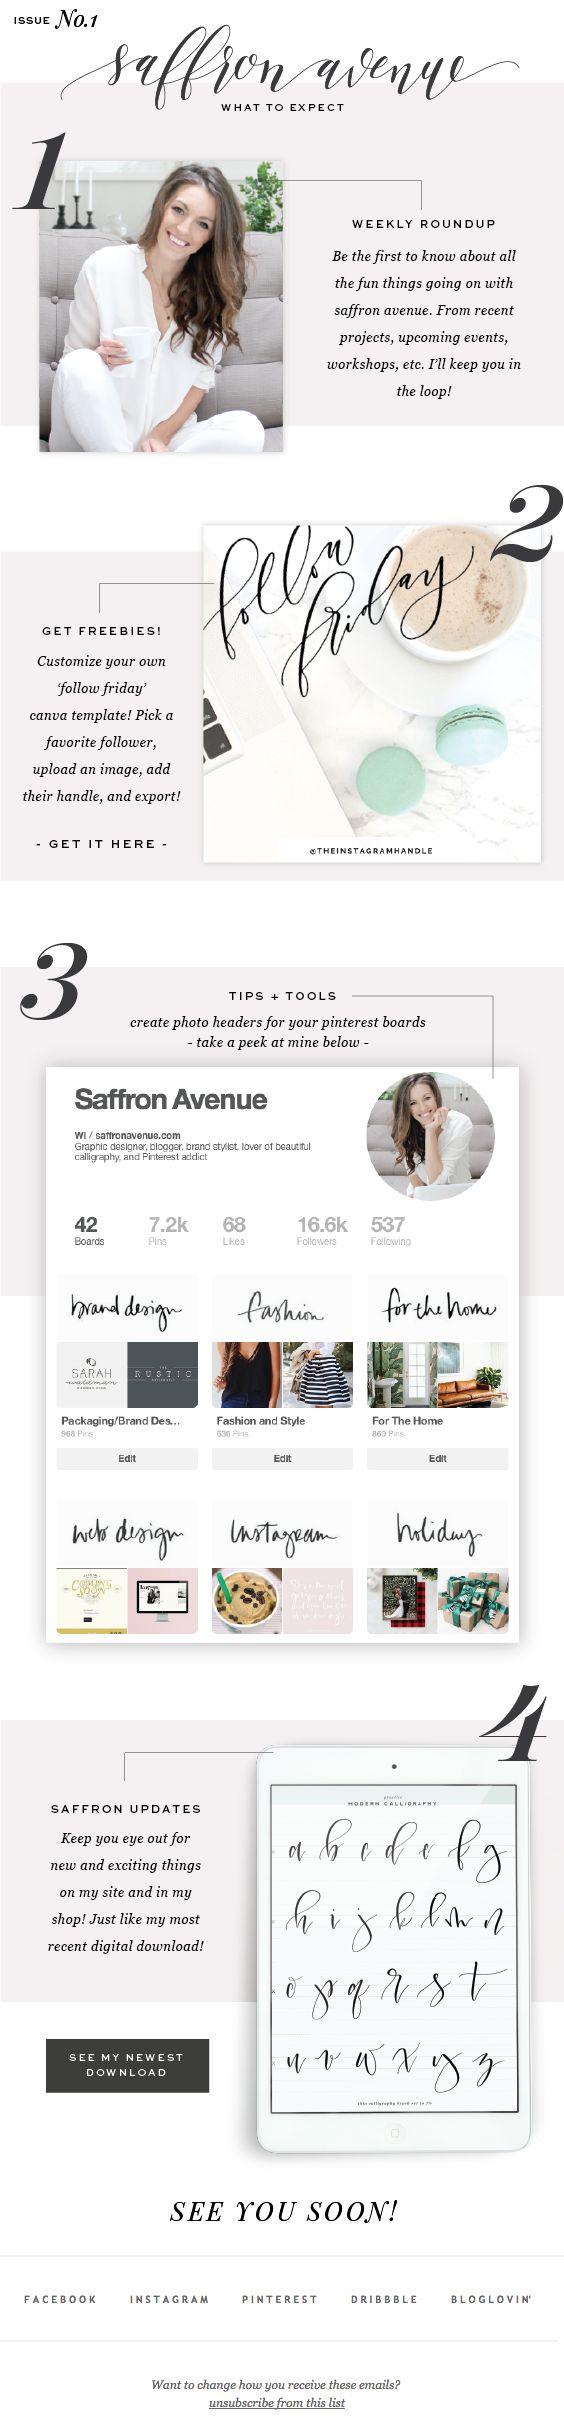 top 25 best logo designer online ideas on pinterest find logo saffron avenue newsletter design graphic design logo design website design free